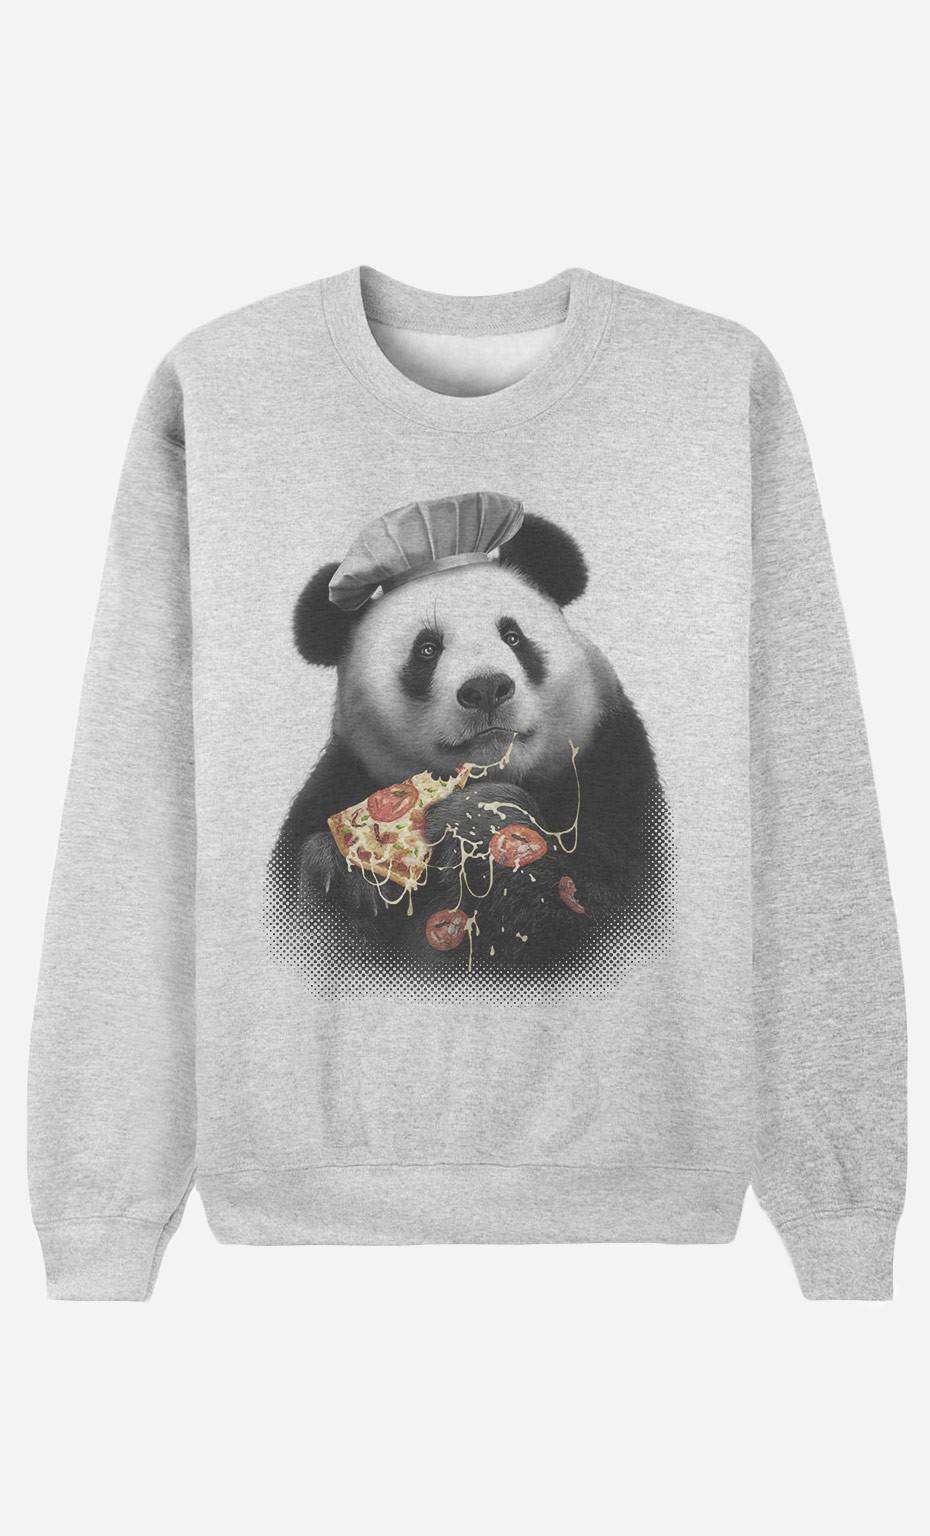 Sweatshirt Panda Pizza